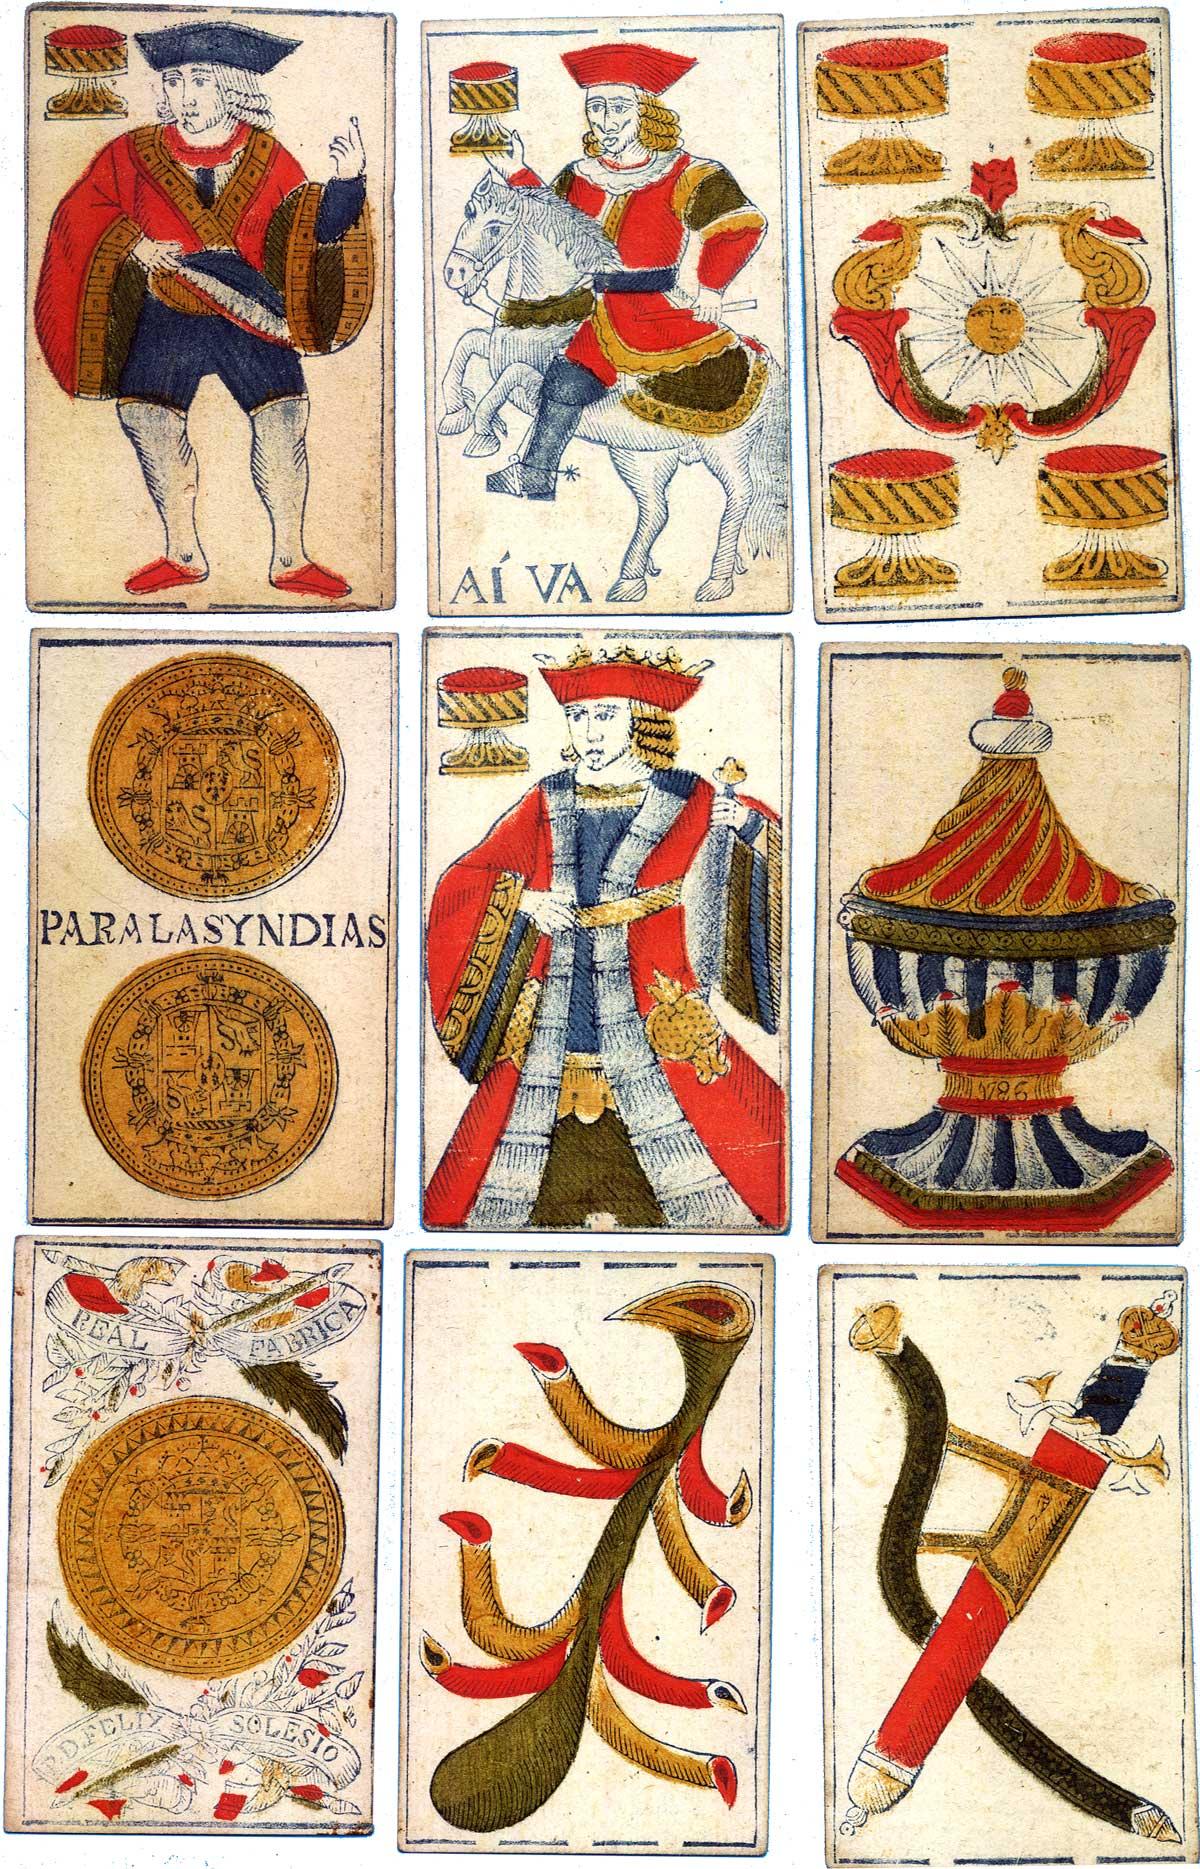 Félix Solesio, Spanish National pattern, 1786